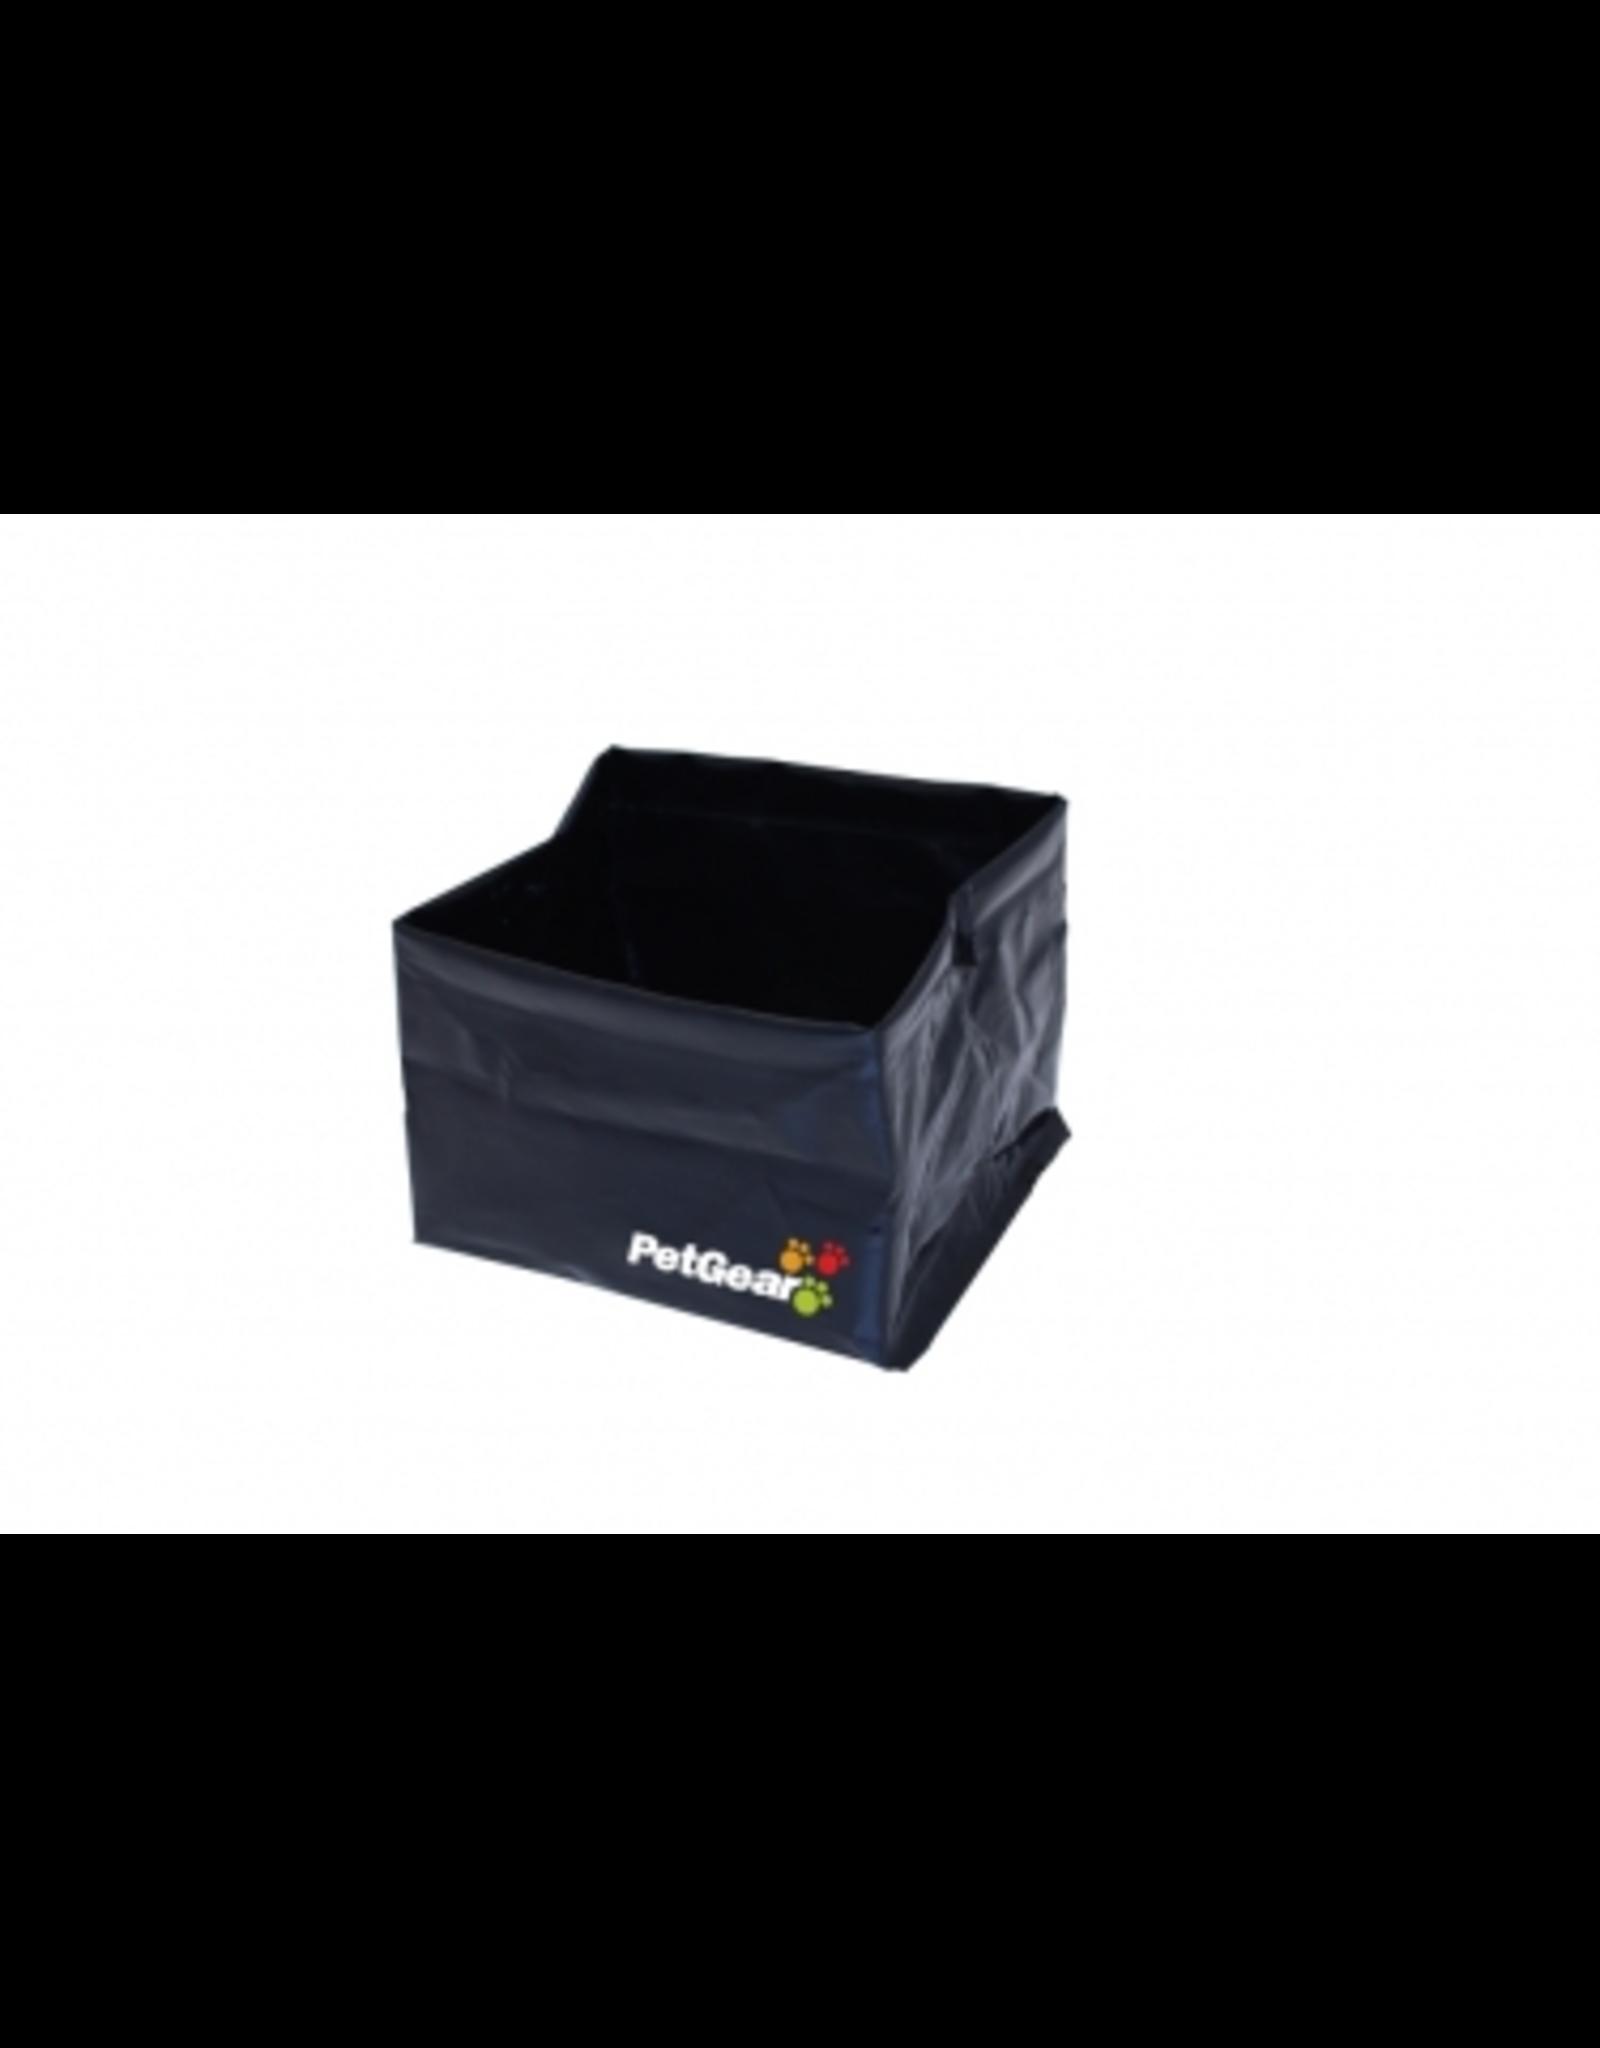 Pet Gear Pet Gear Foldable Bowl 3 Pack